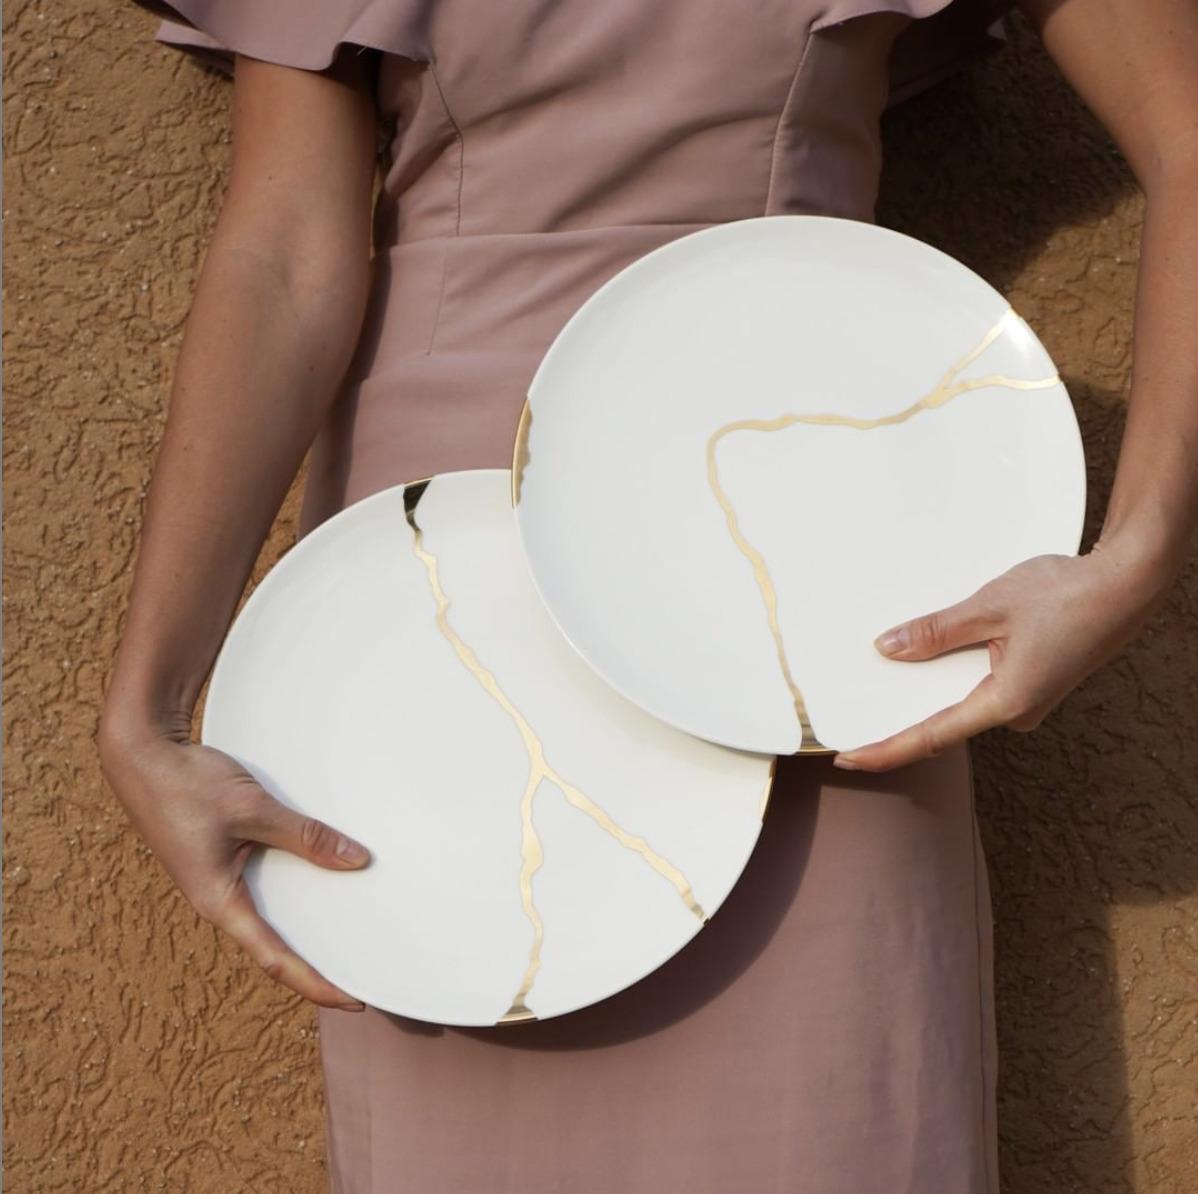 kintsugi plates held by woman